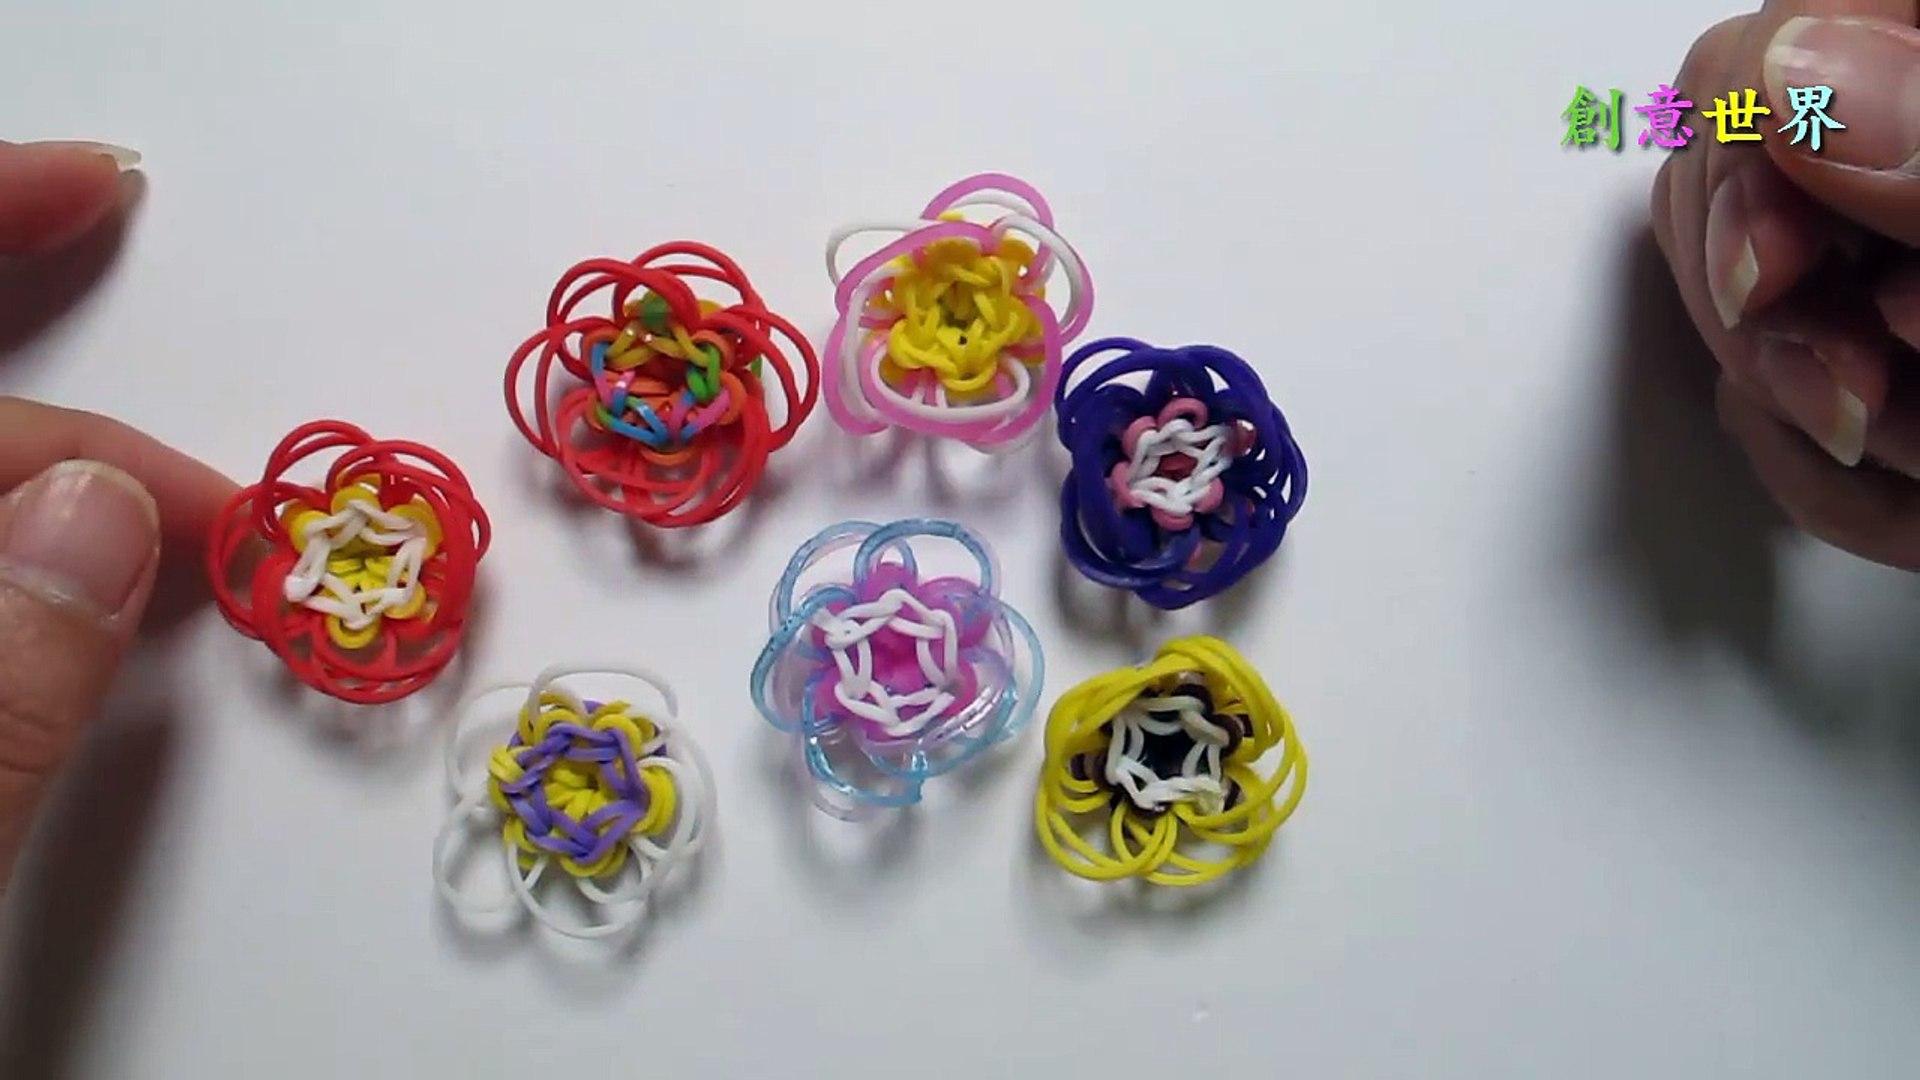 DIY 彩虹編織花 Rainbow Bloom Flower Charms - 彩虹編織器中文教學 Rainbow Loom Chinese Tutorial